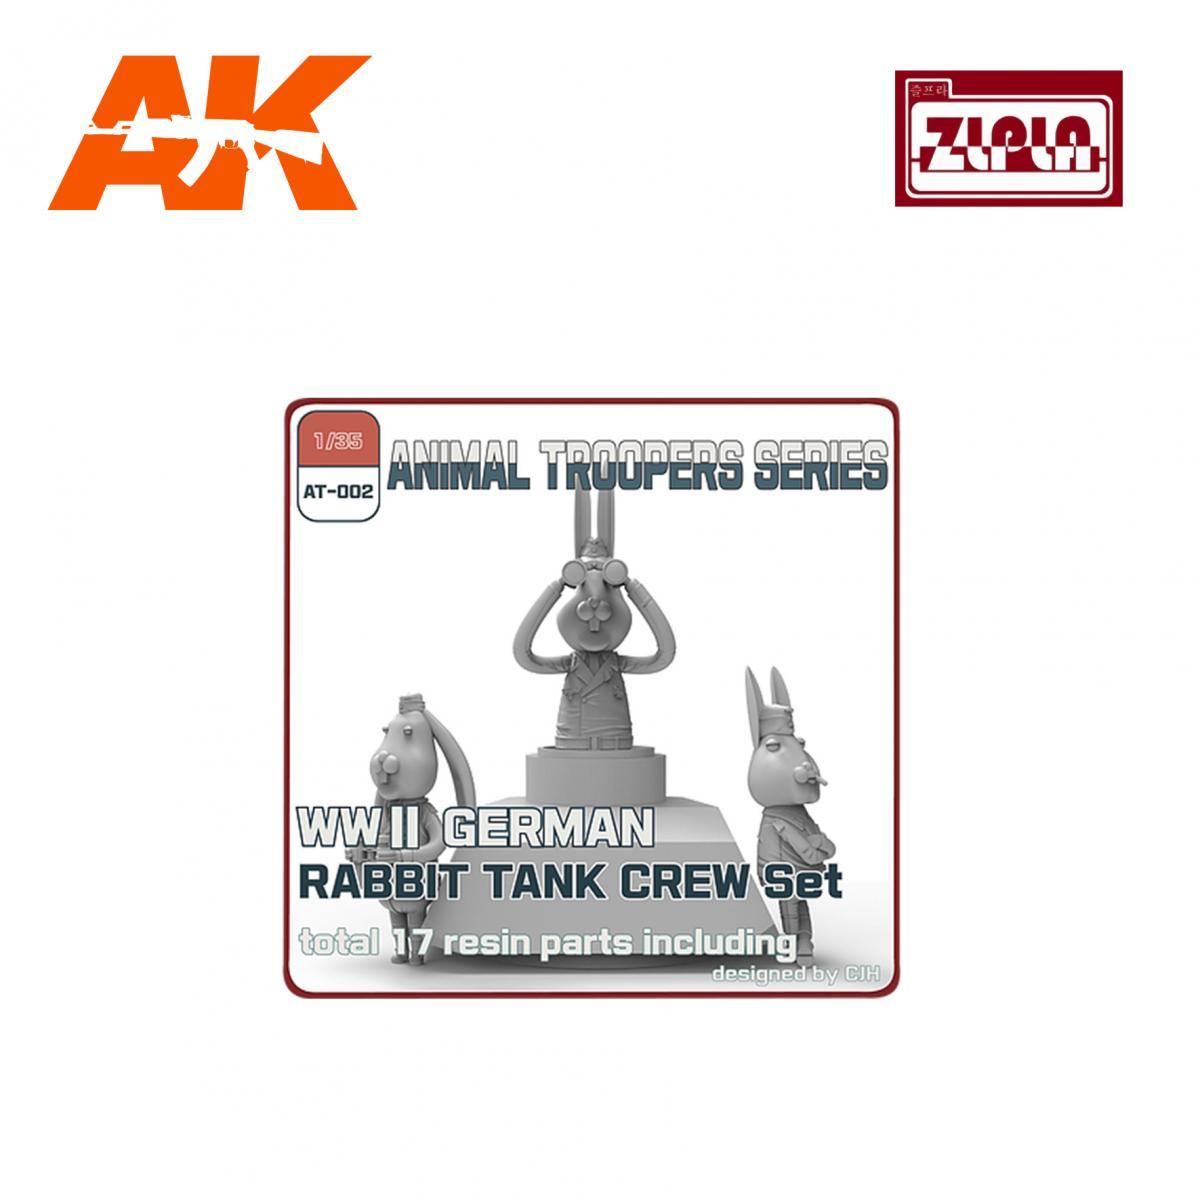 ZLPLA WWII German Rabbit Tank Crew Set